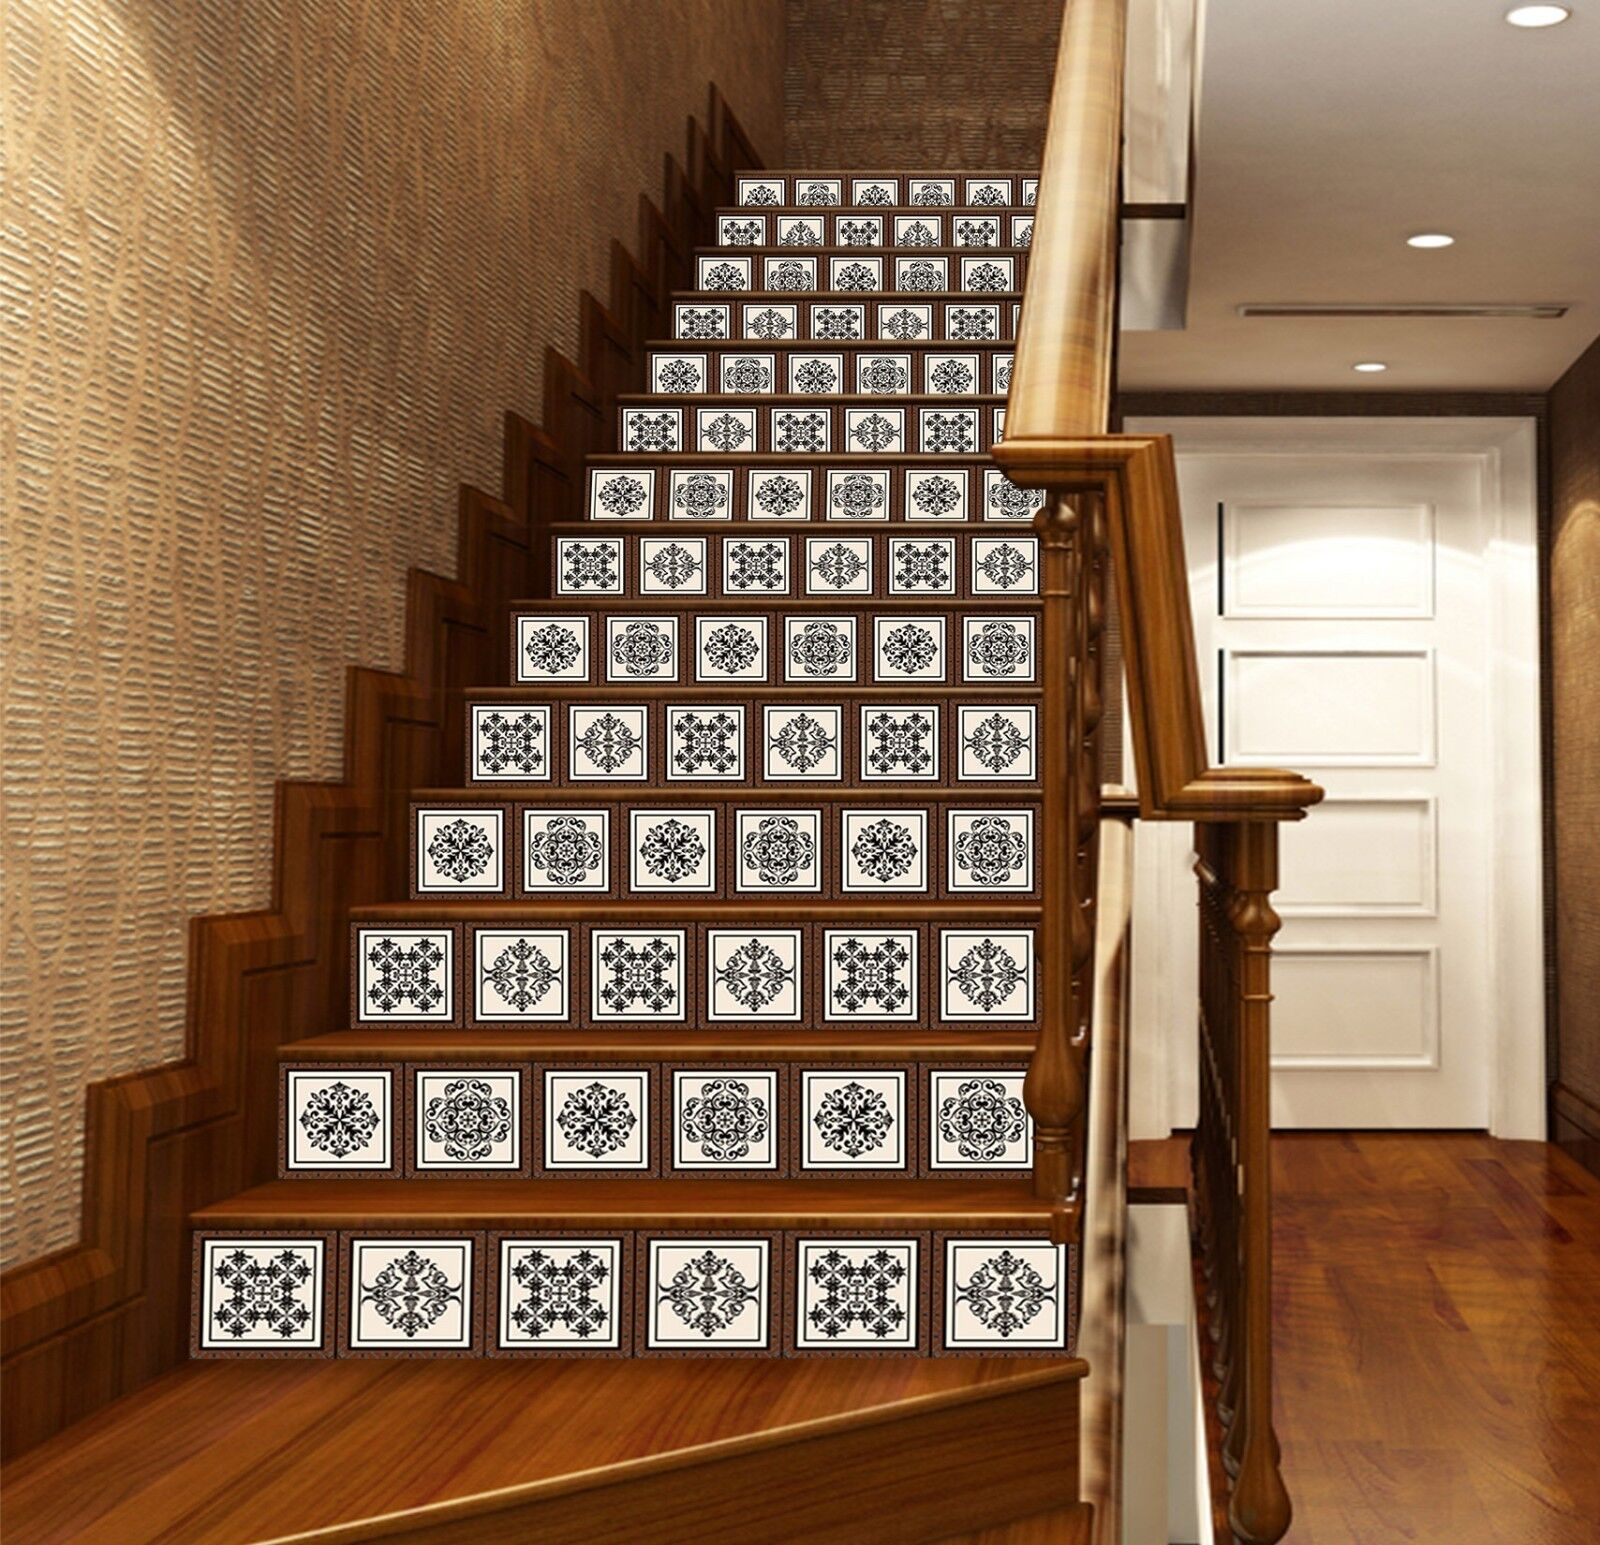 3D Totems 637 Stair Riser Decoration Photo Mural Vinyl Decal Wallpaper UK Lemon